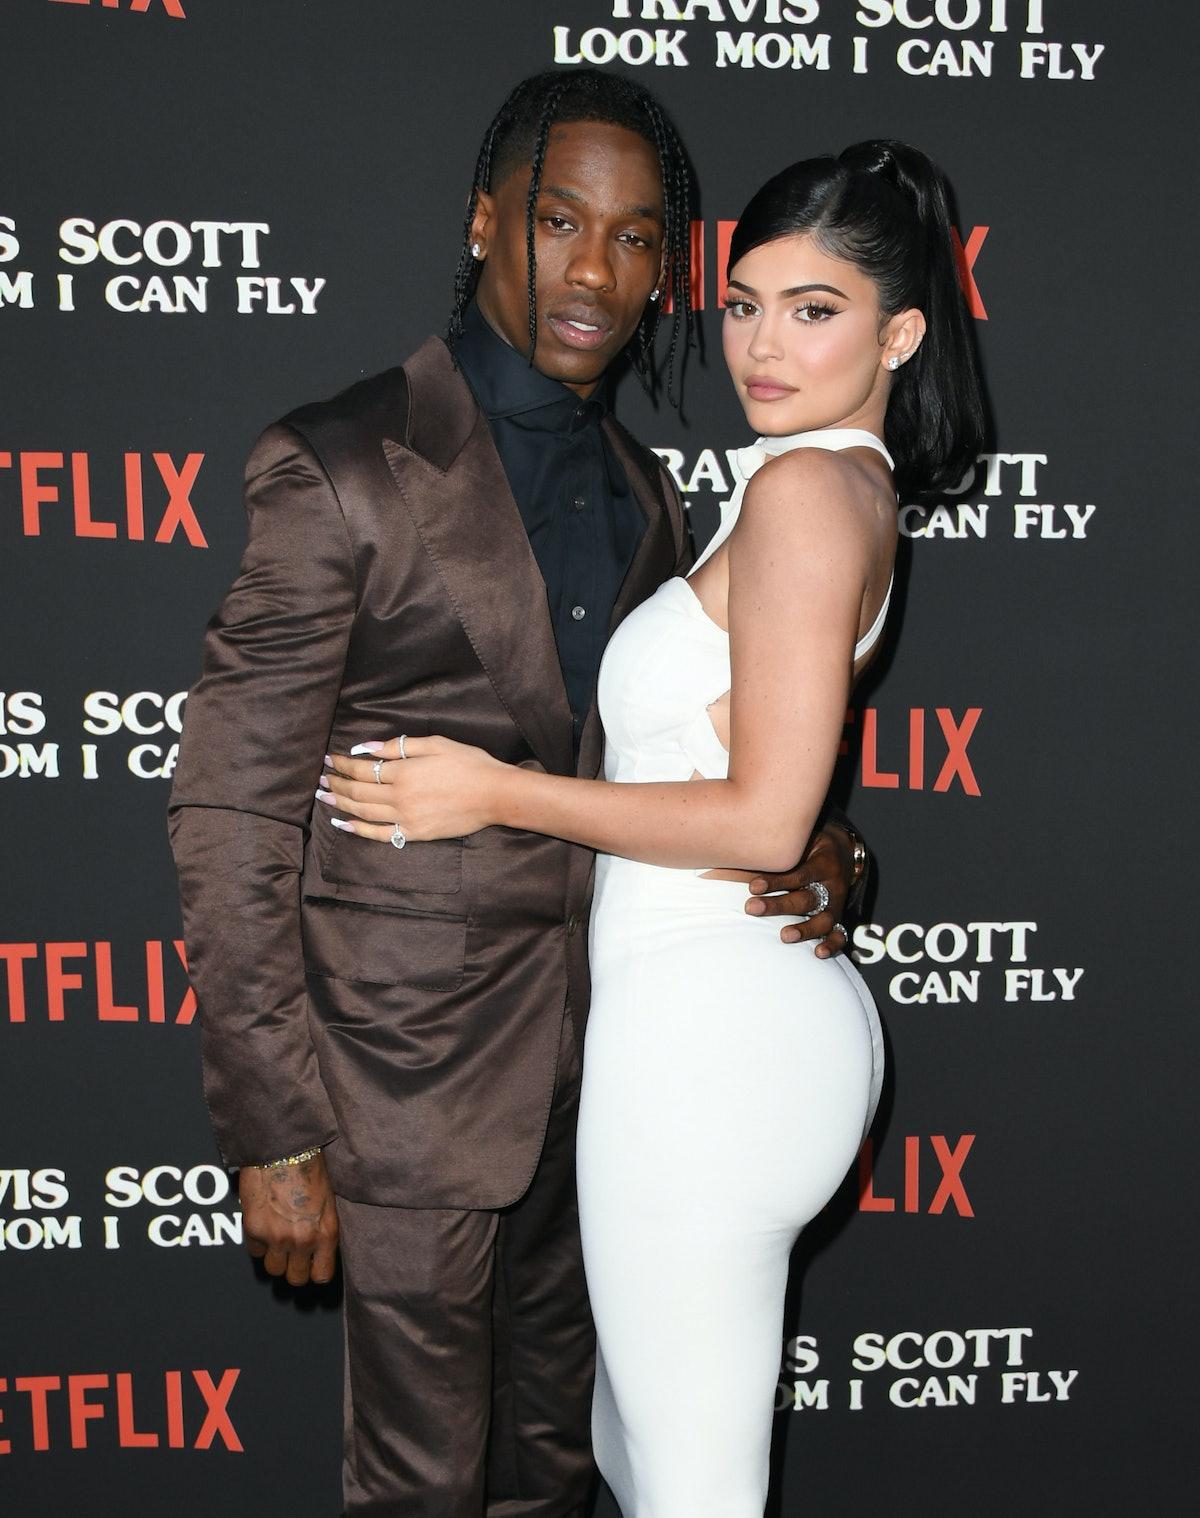 SANTA MONICA, CALIFORNIA - AUGUST 27:  Travis Scott and Kylie Jenner attend the Premiere Of Netflix'...